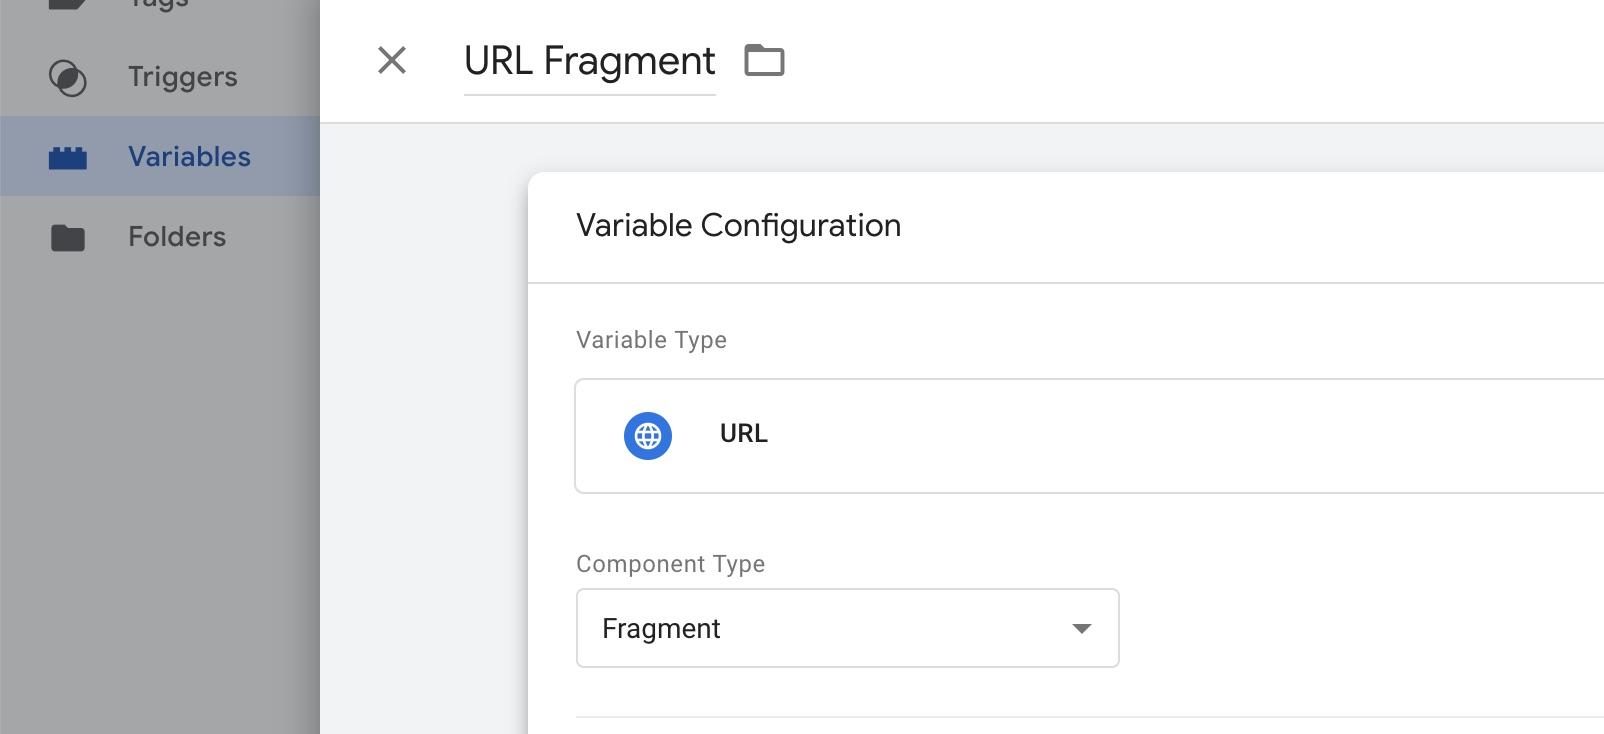 URL Fragment